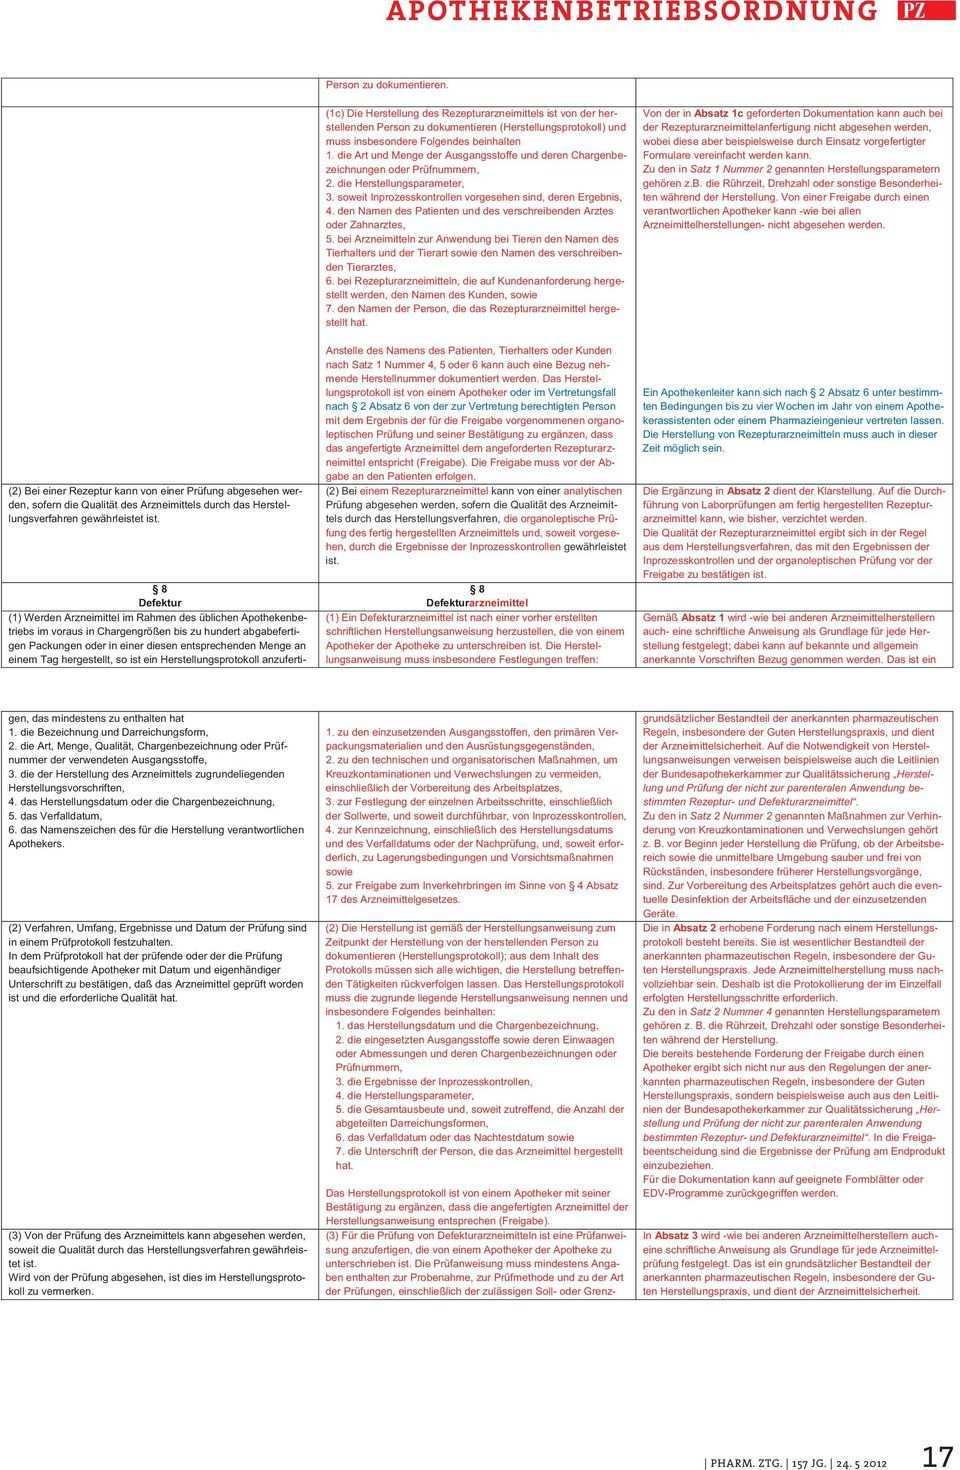 Apotheken Betriebsordnung Pdf Kostenfreier Download